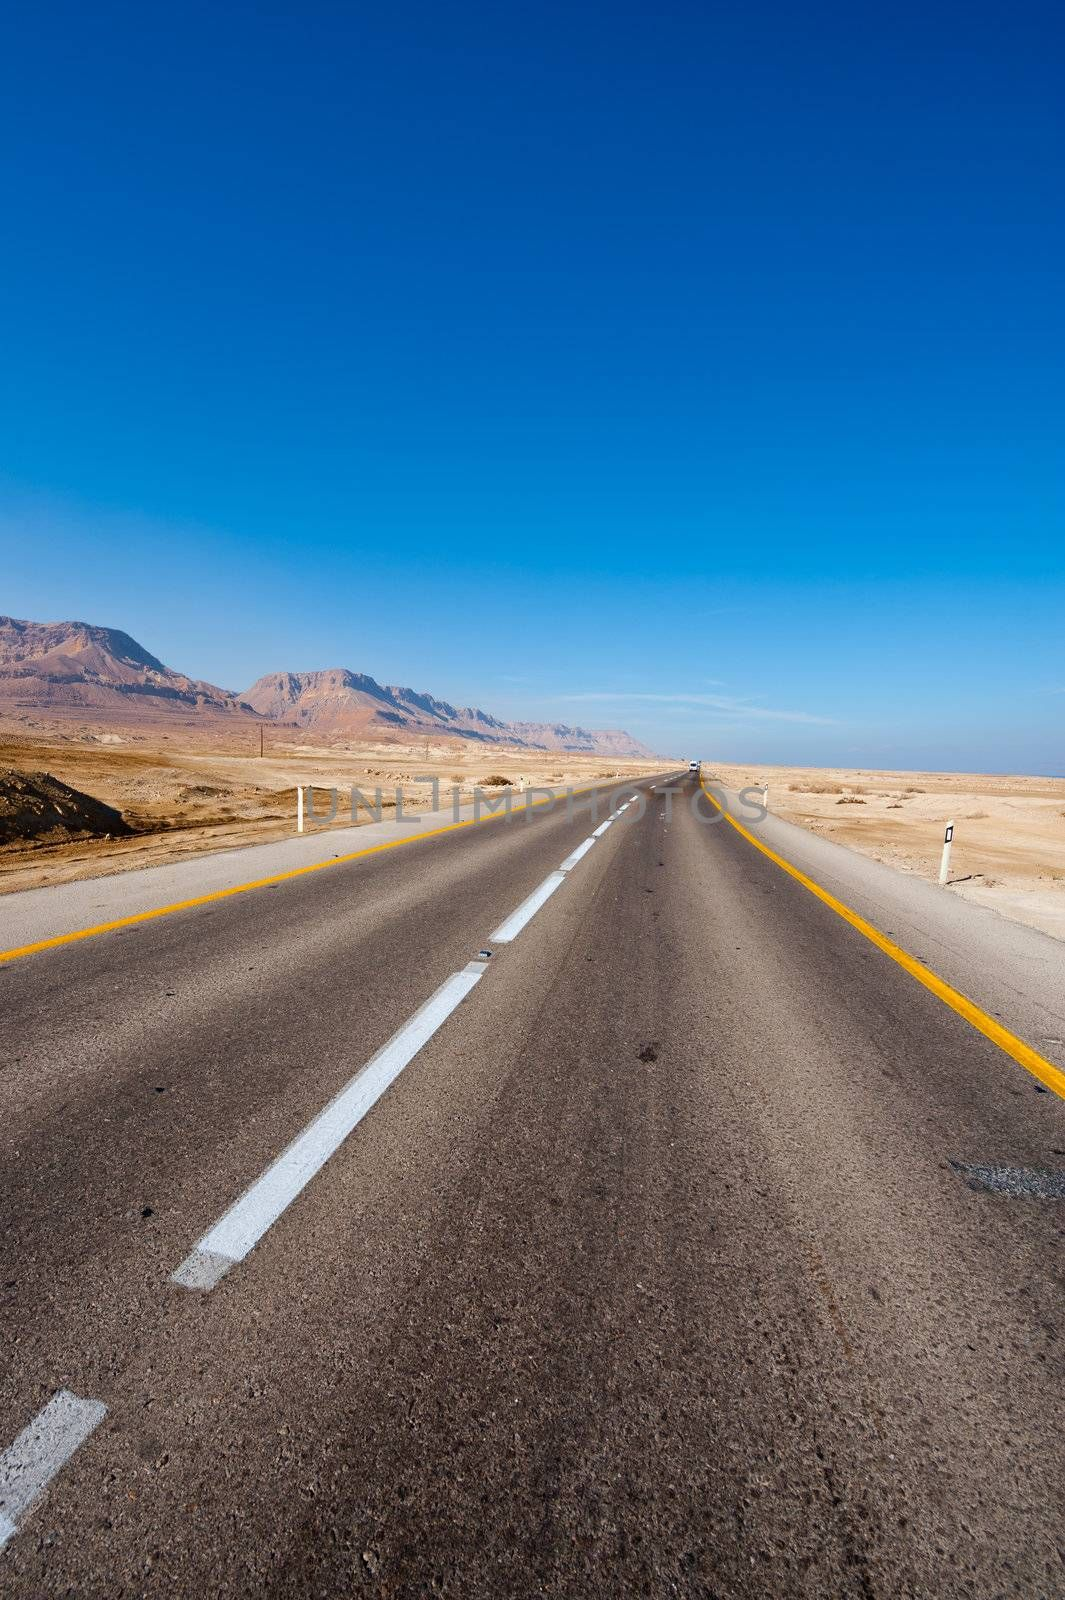 Asphalt Road along the Coast of Dead Sea, Israel